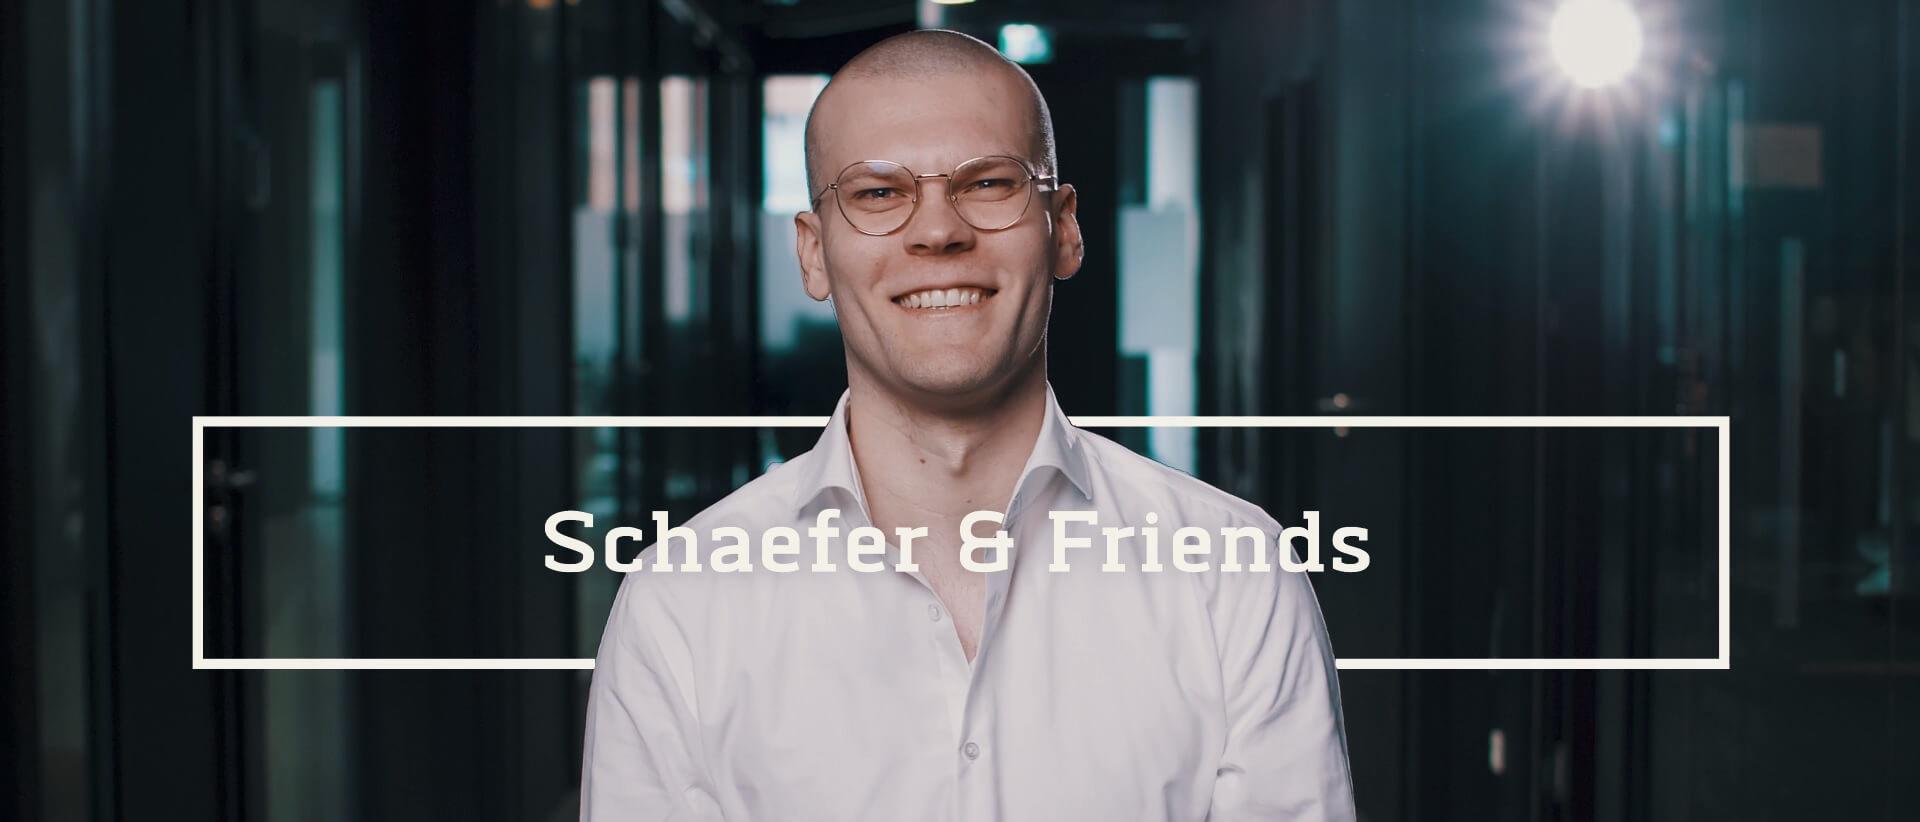 Schaefer & Friends - Kampagne